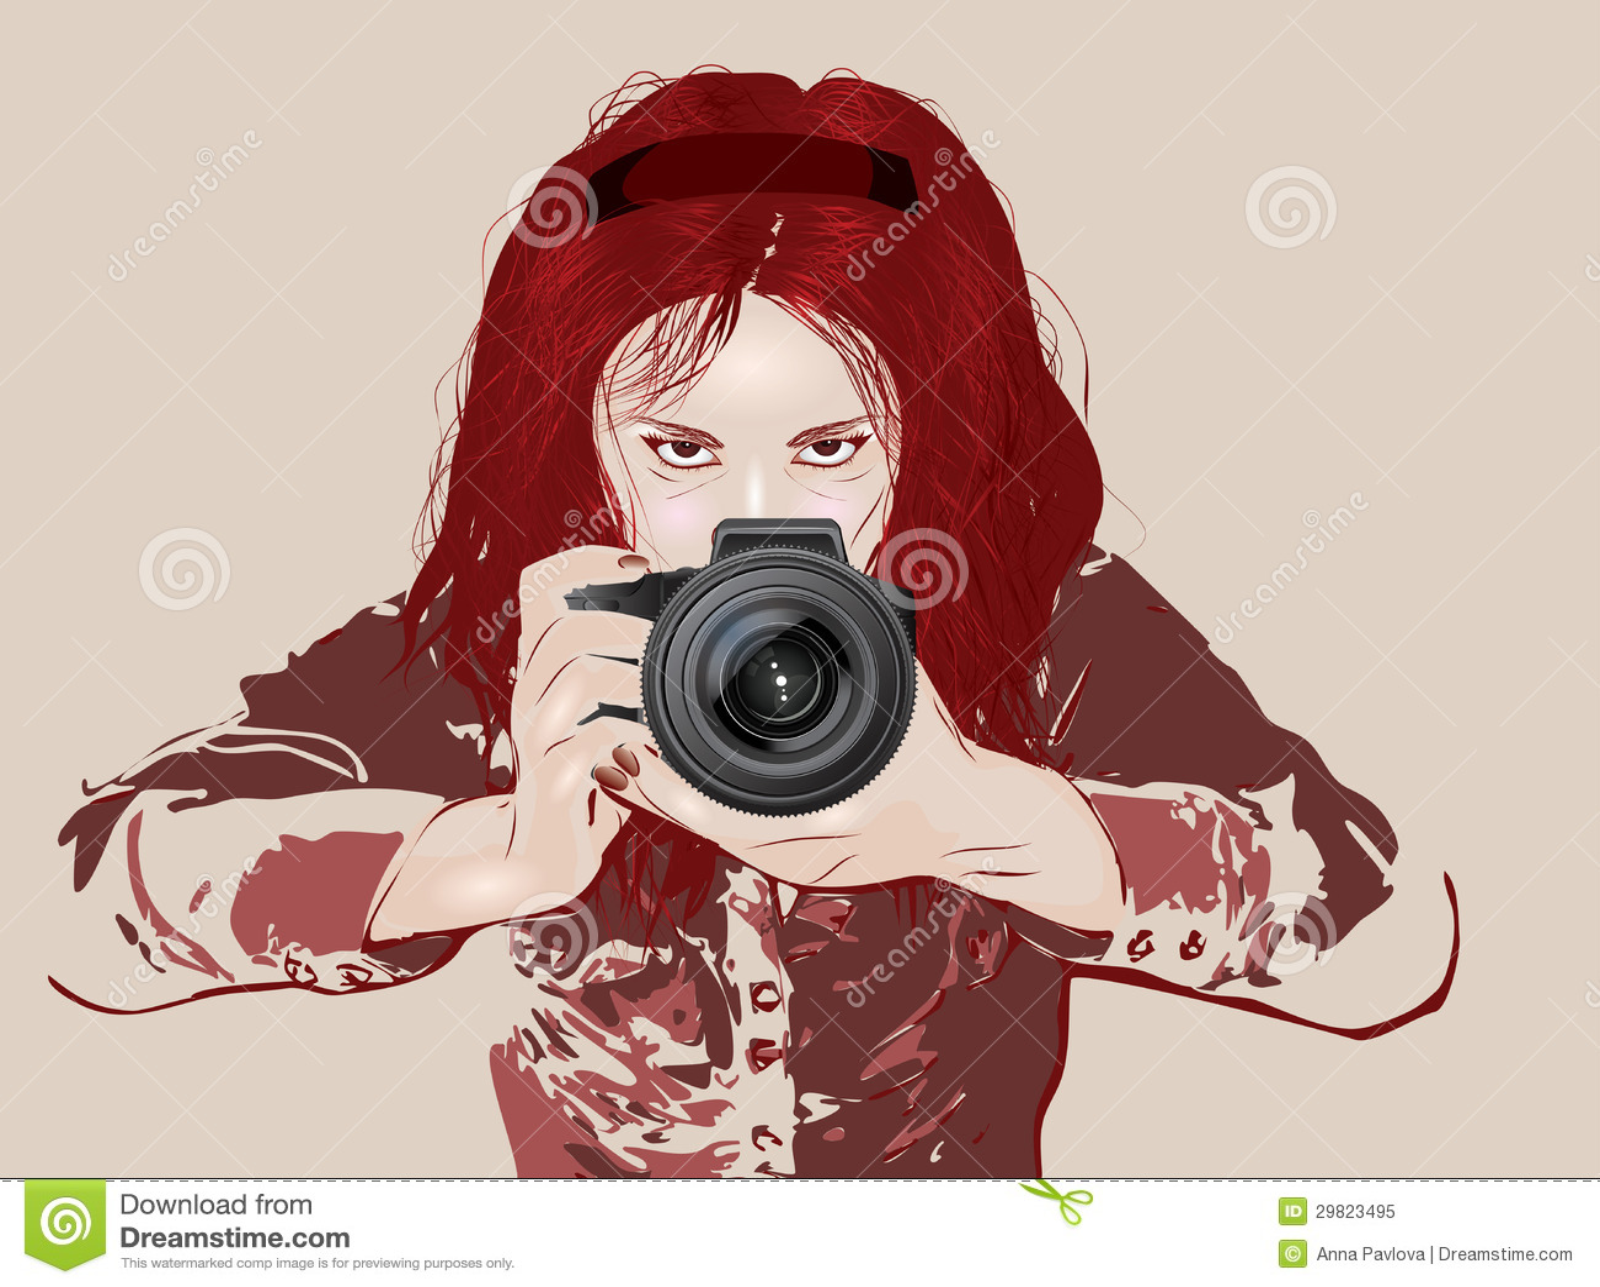 Grunge Camera Vector : Female photographer stock vector. illustration of cartoon 29823495